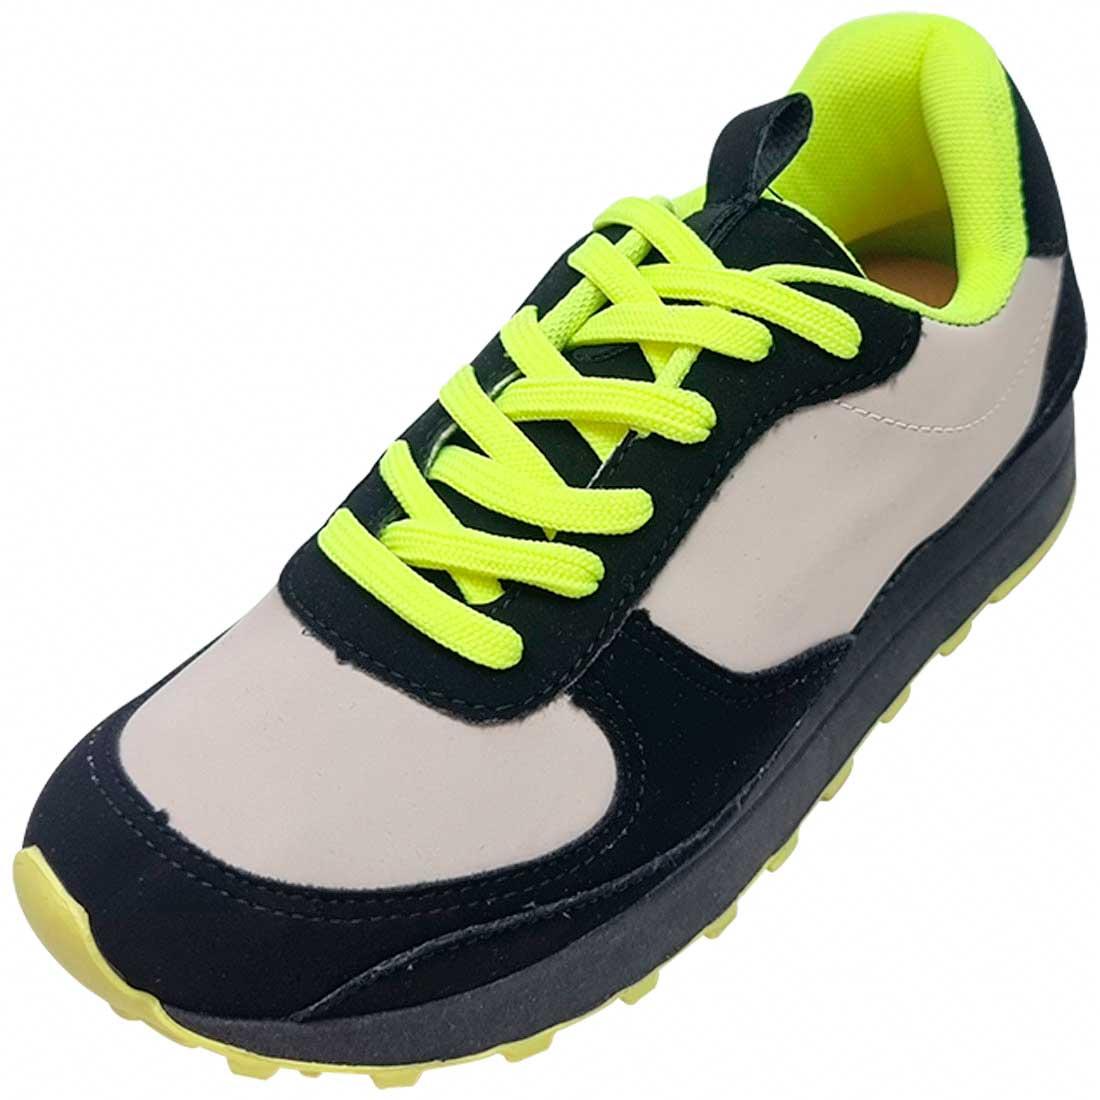 Tênis Jogging - Preto, Cinza e Amarelo